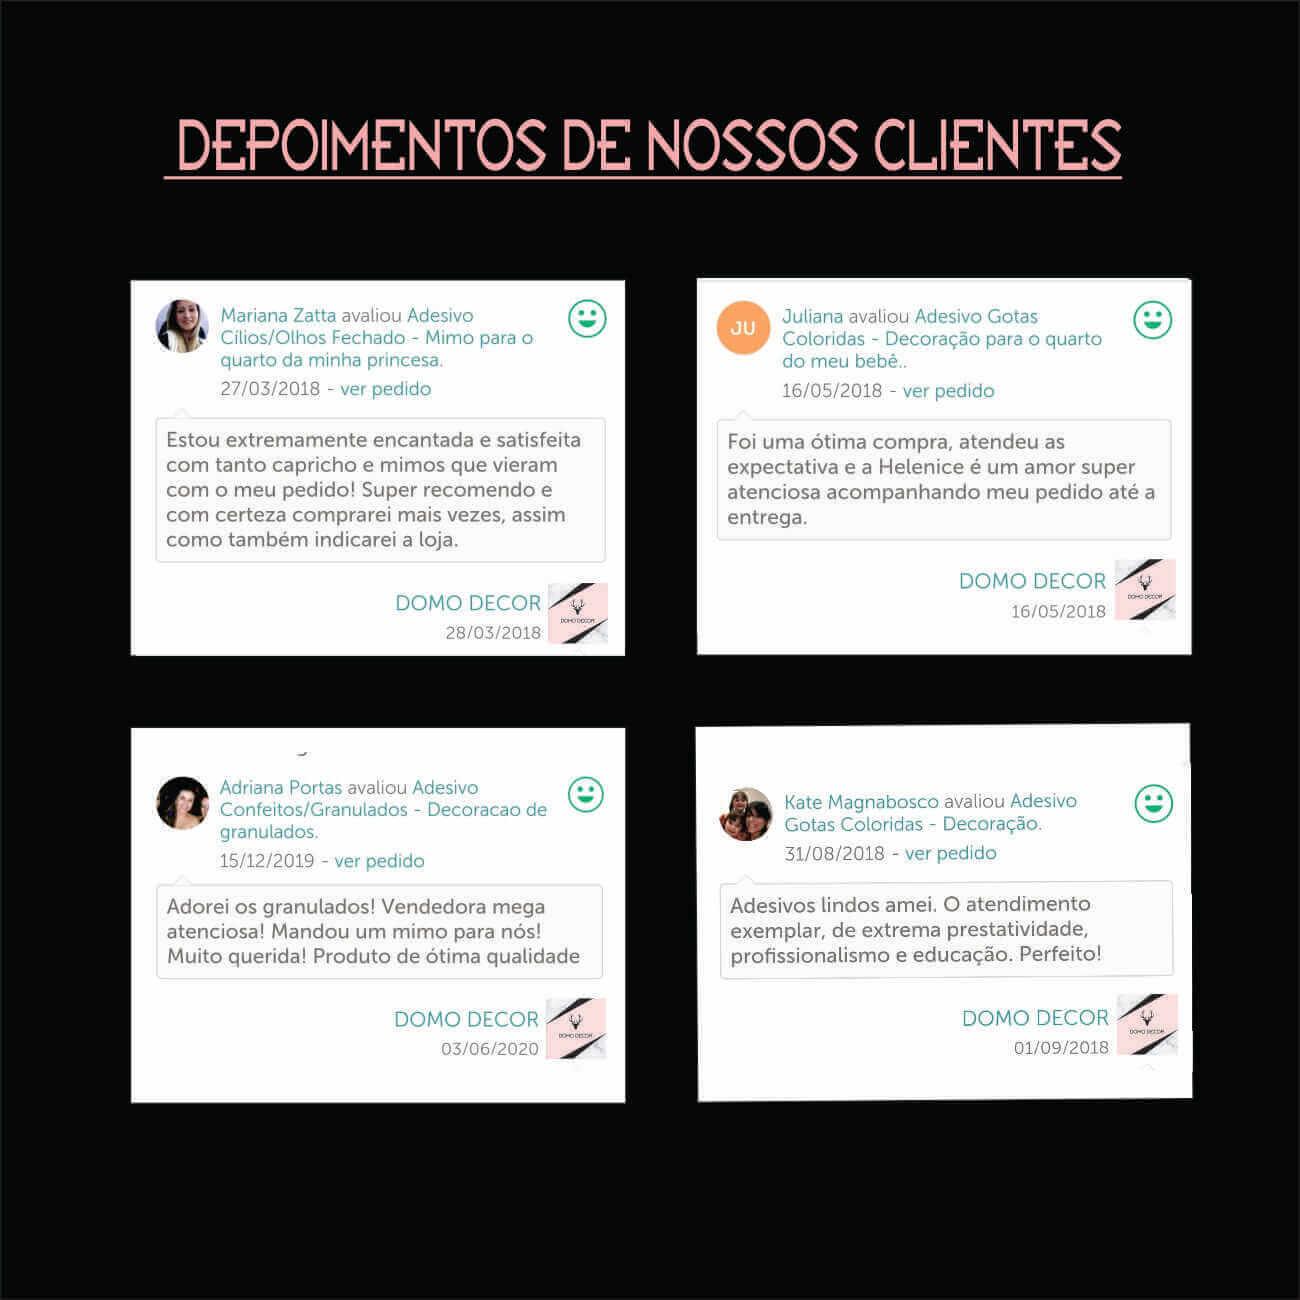 ADESIVO PEGADAS INTEIRAS E VAZADAS